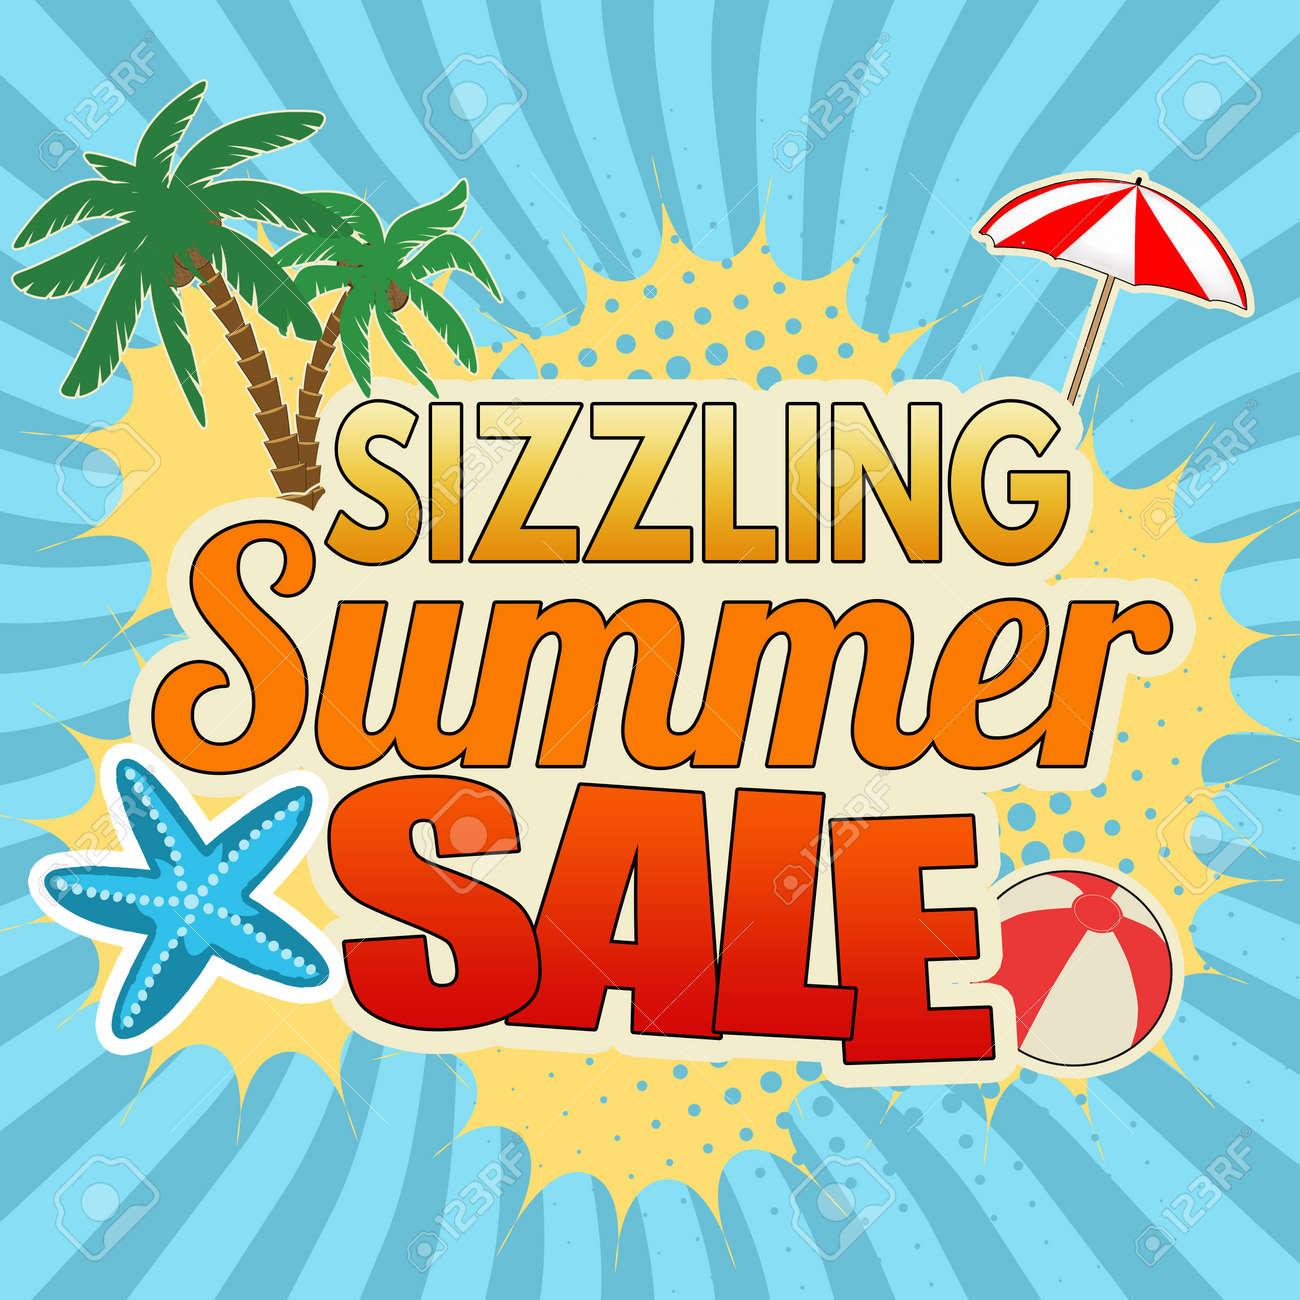 Sizzling summer sale advertising poster design on blue, vector illustration - 81559311